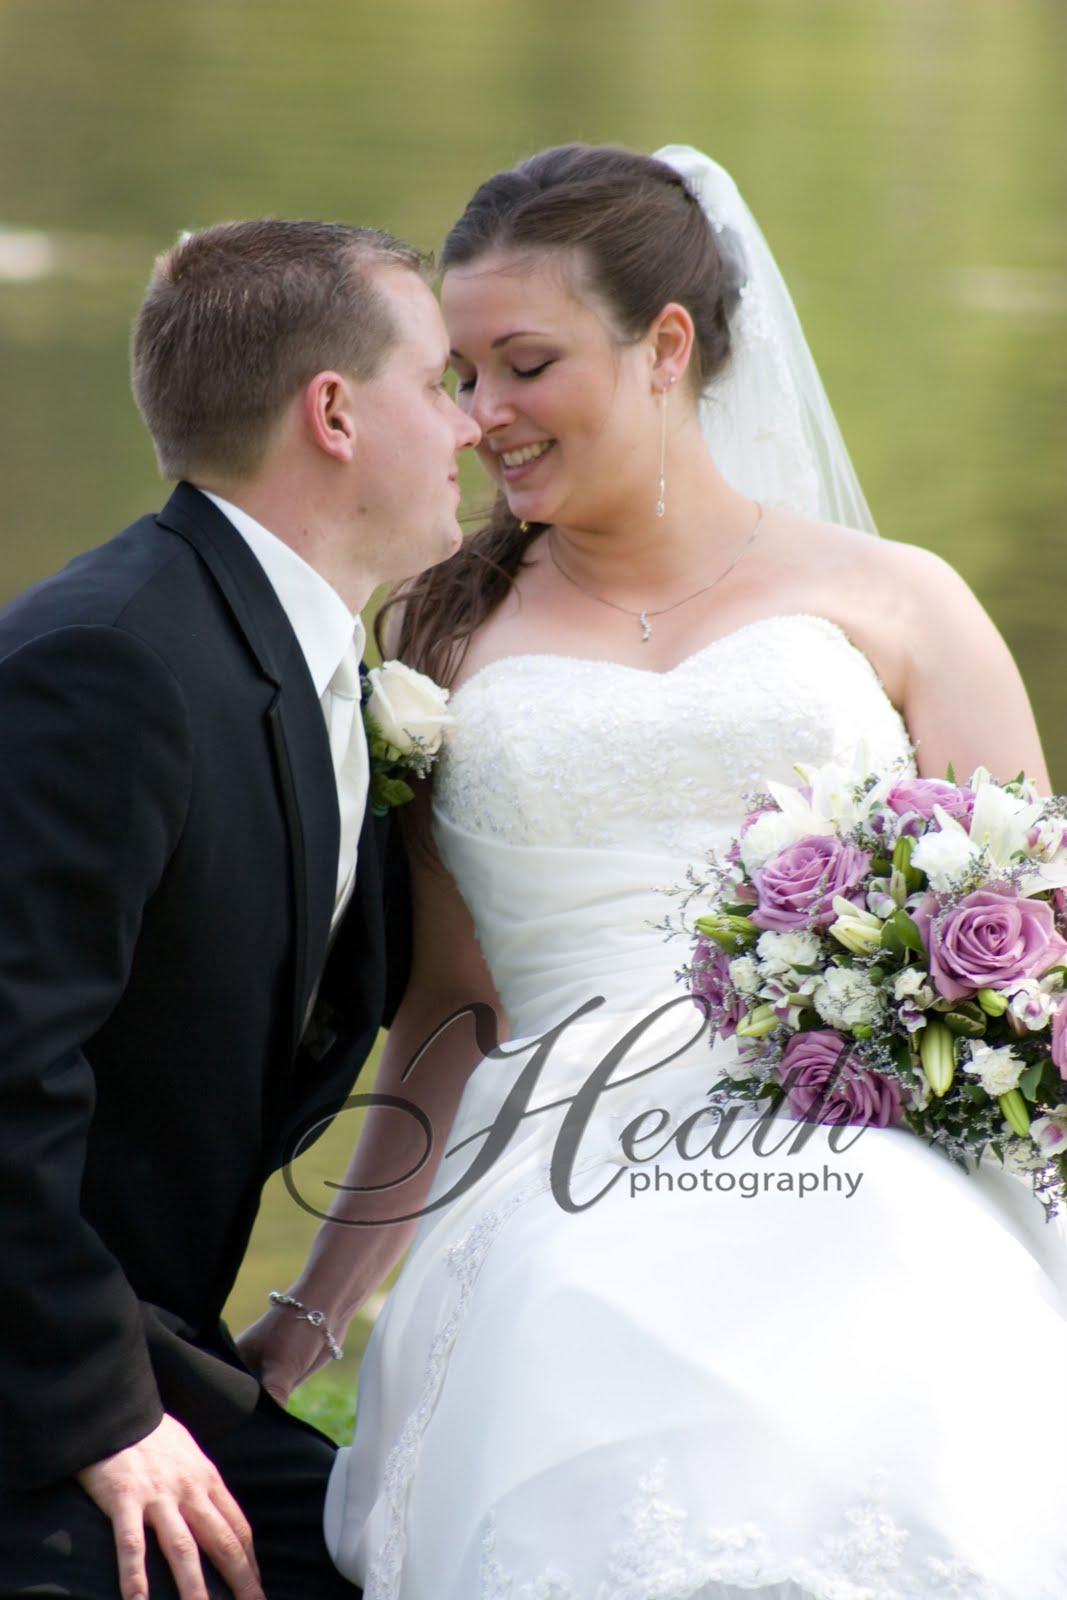 Heath Photography | celebrating families & their joys | Page 19